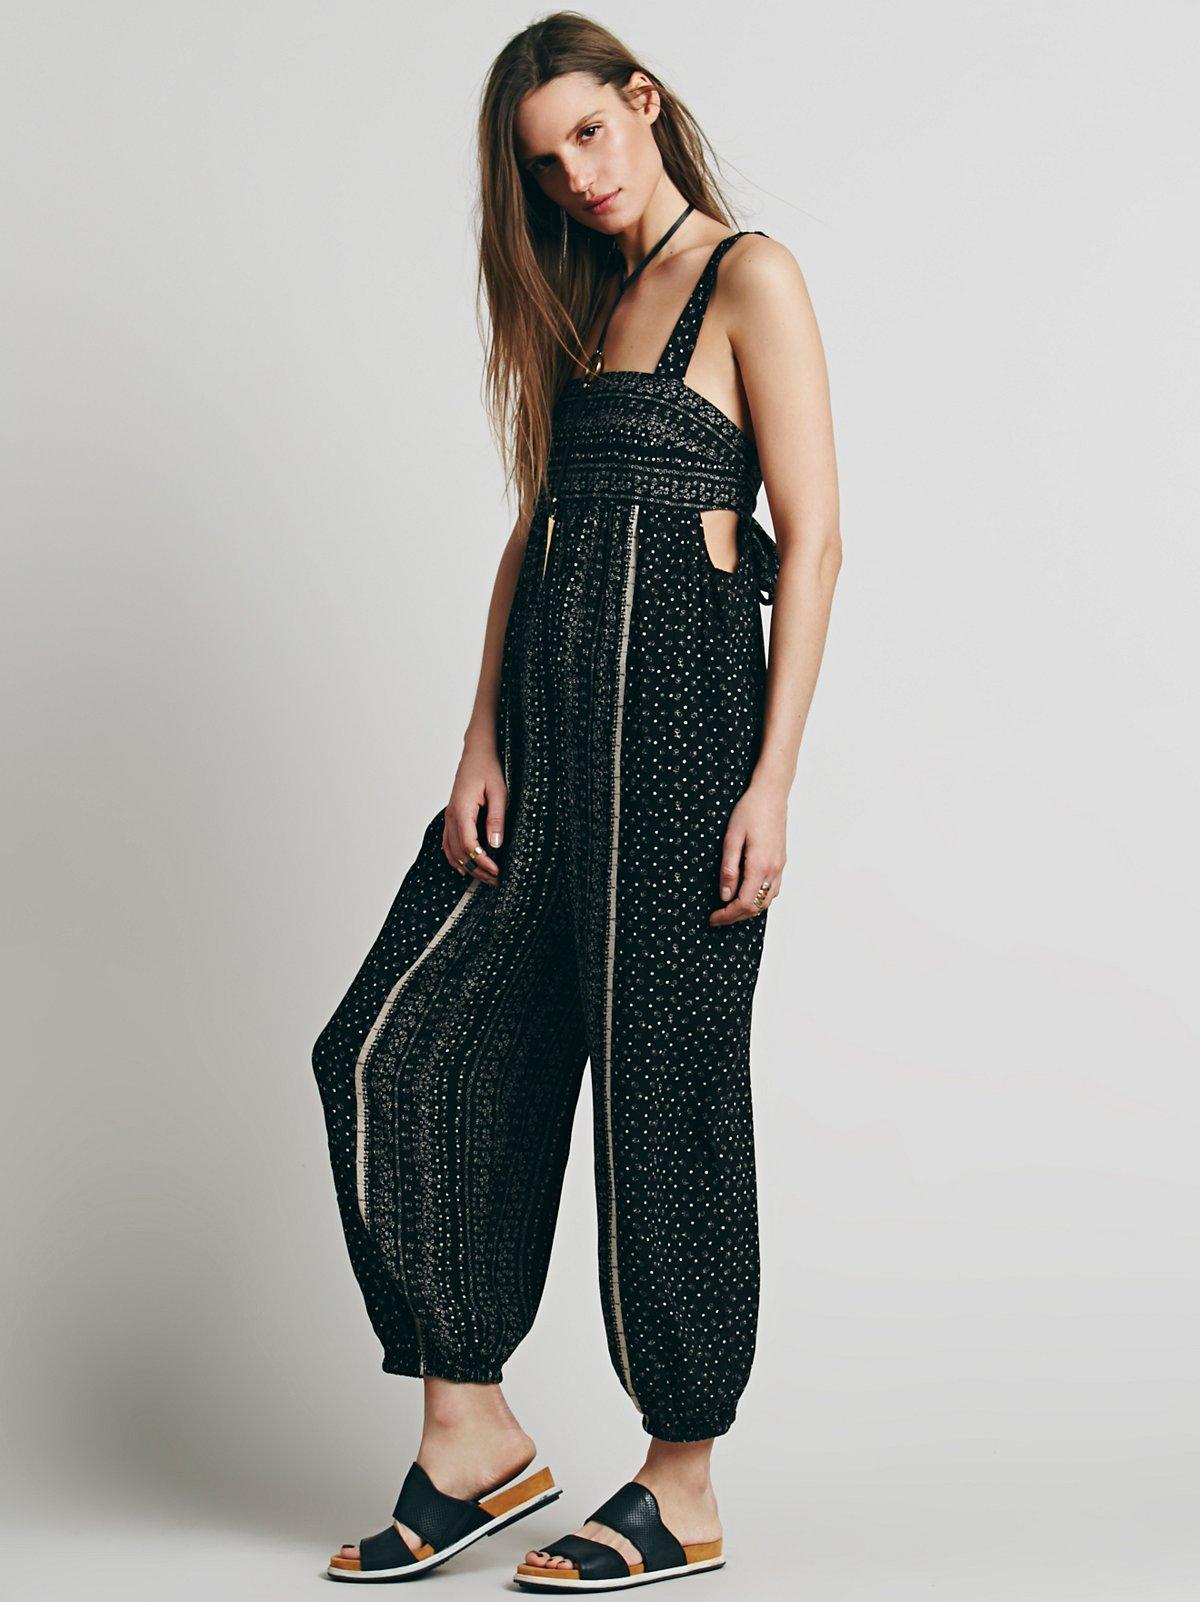 Firefly连体裤